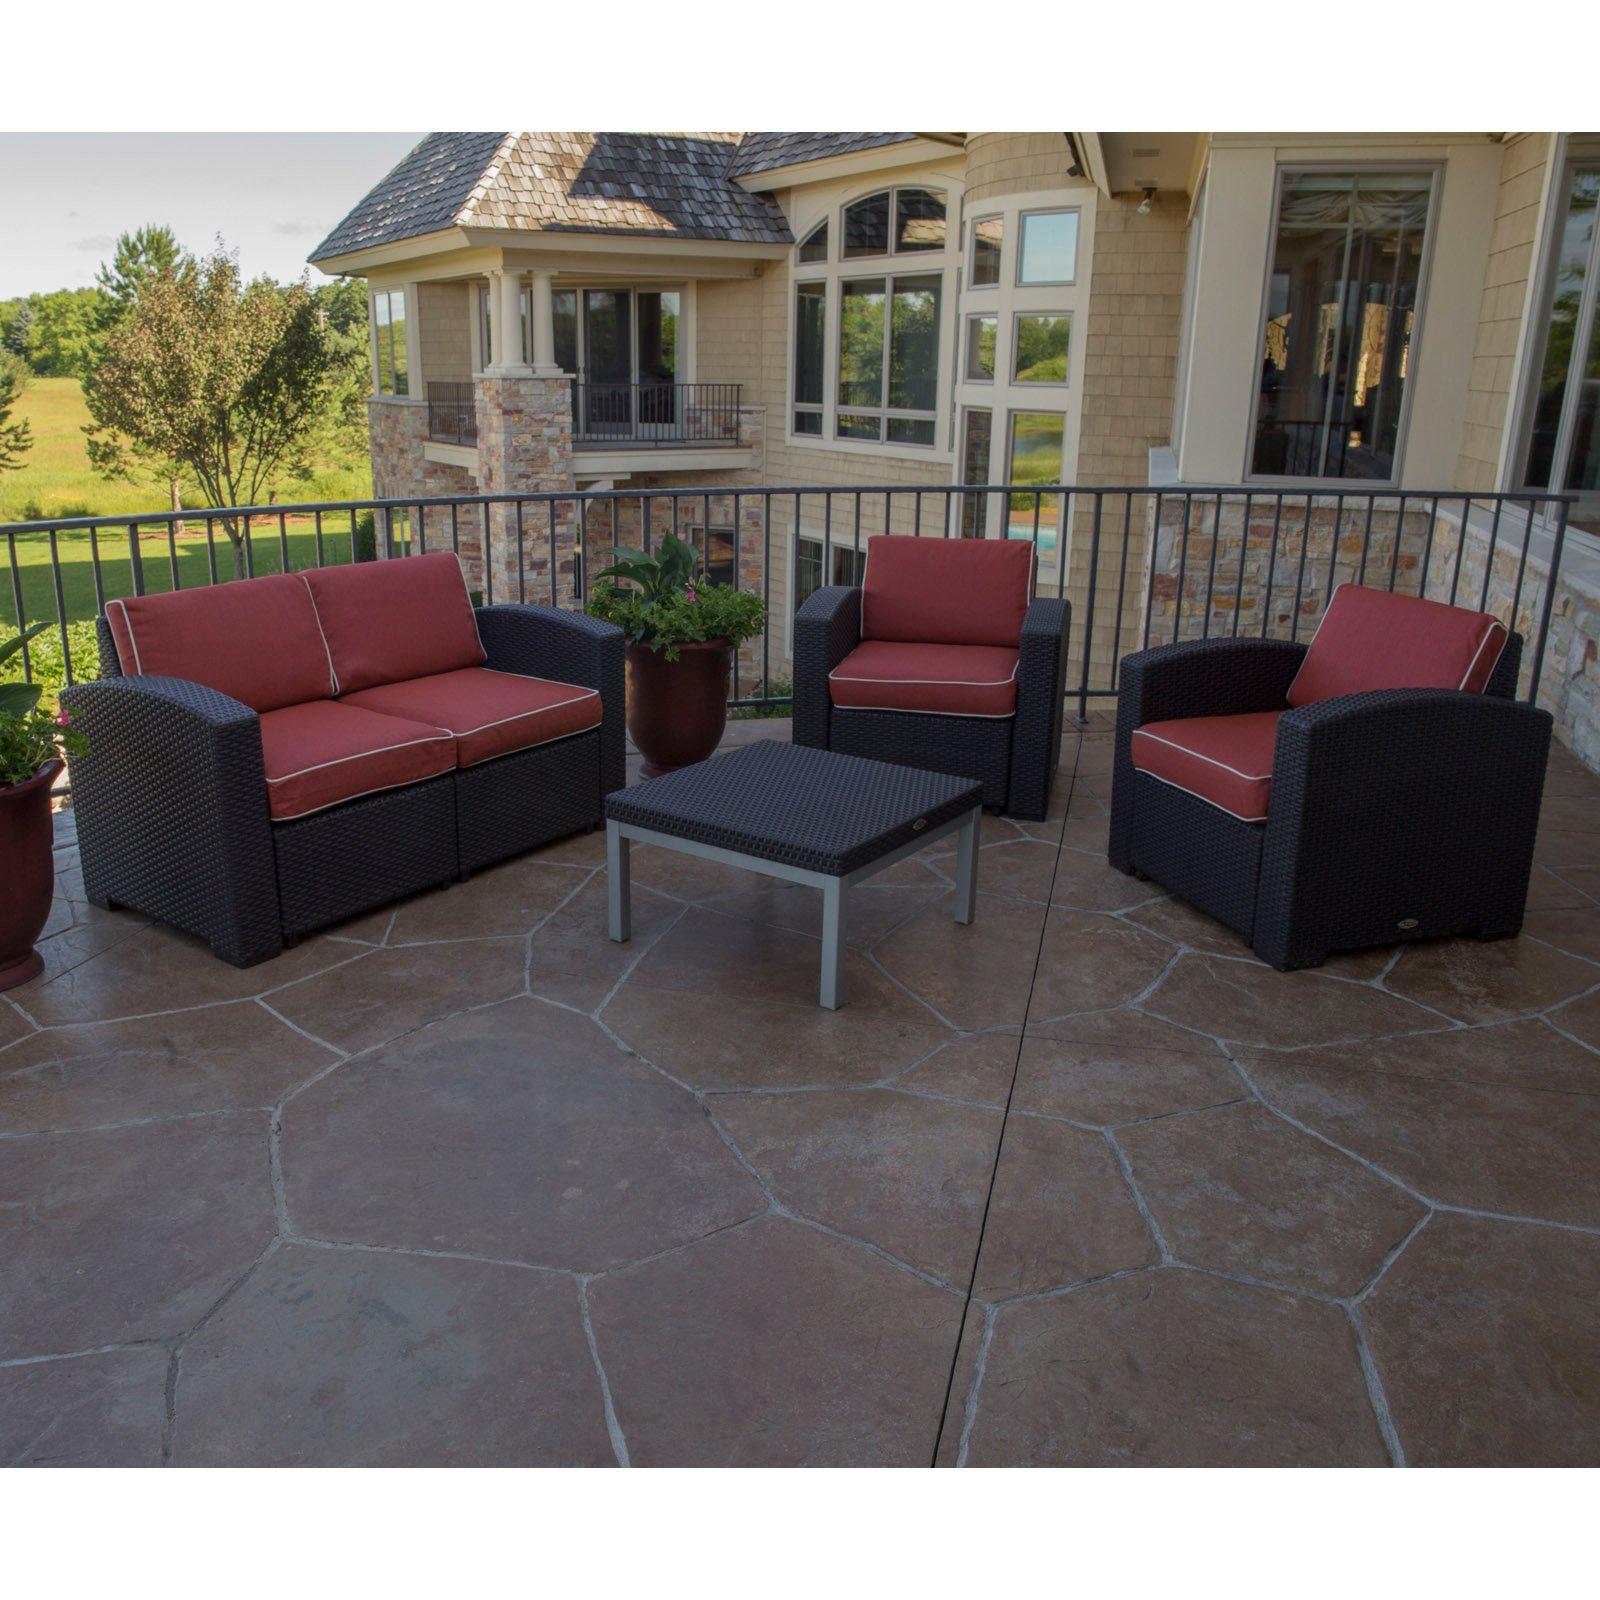 Strata Furniture Cielo 4 Piece Chair and Loveseat Conversation Set